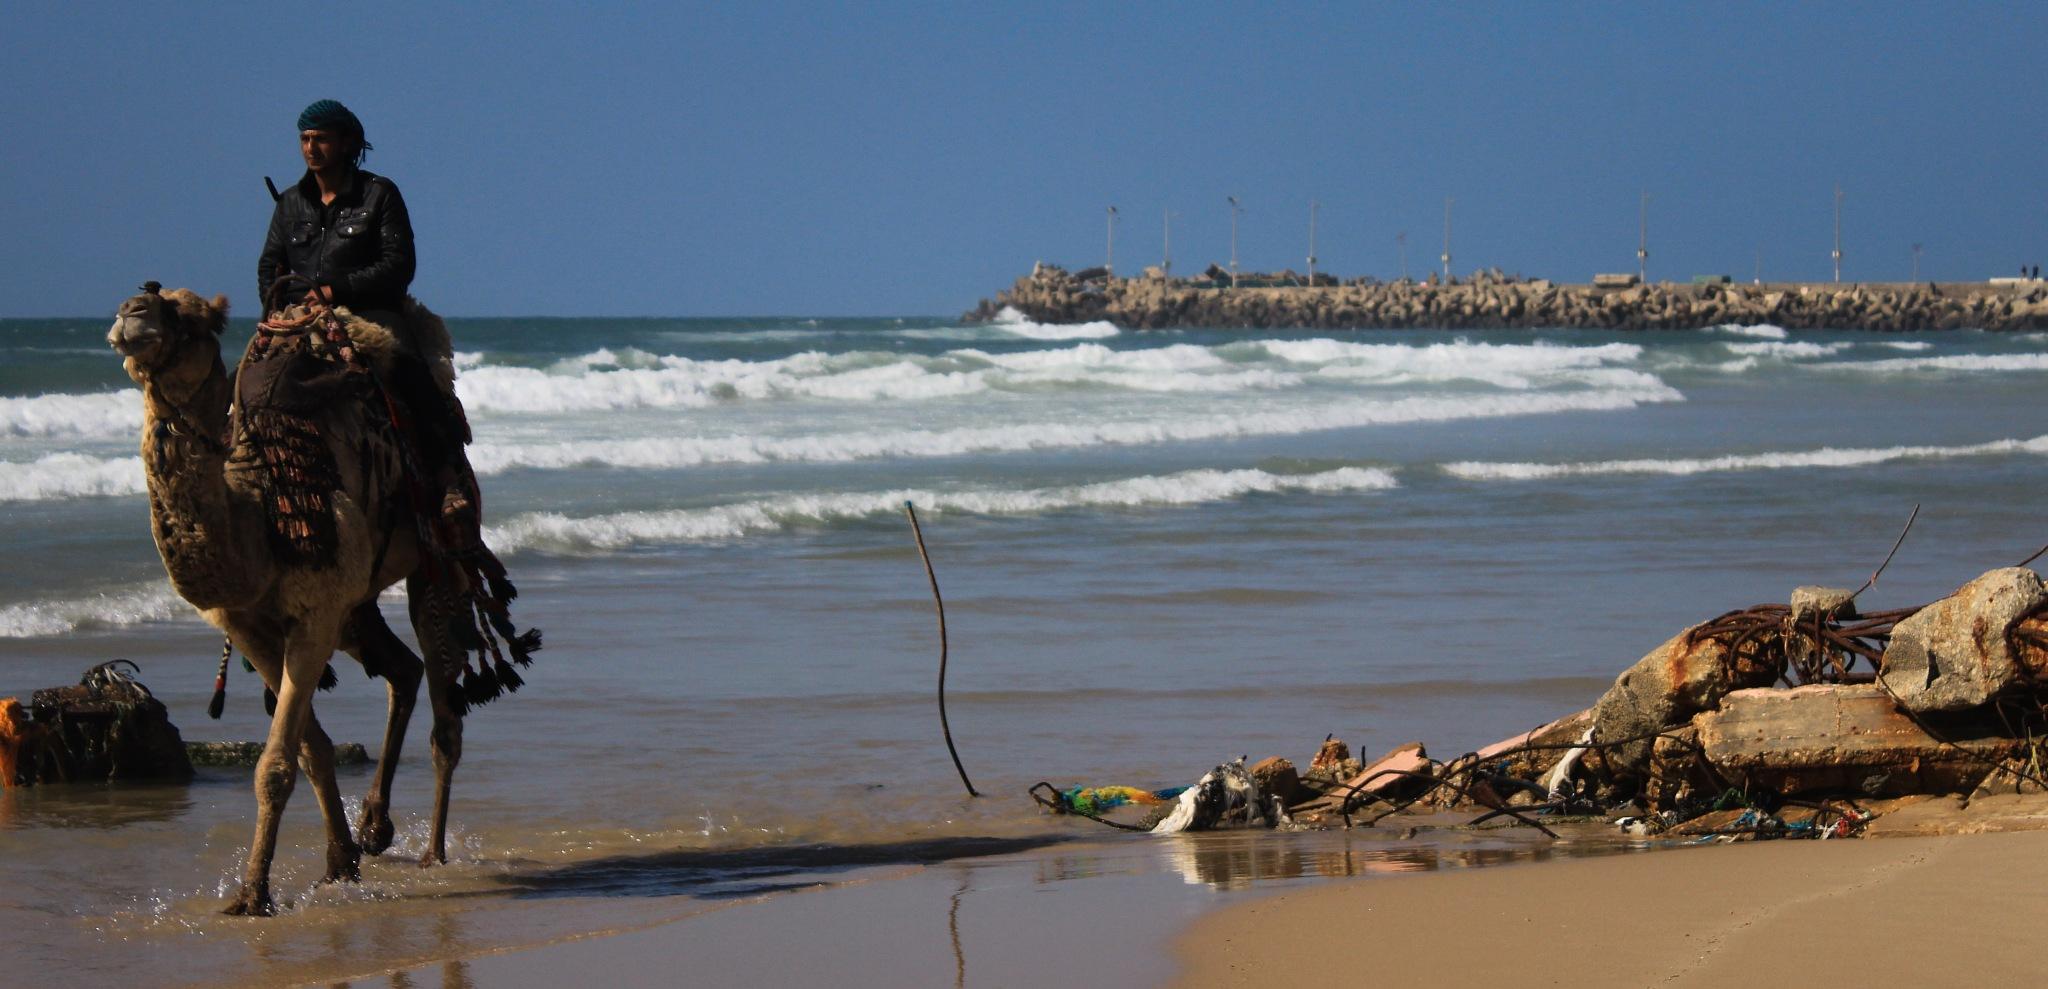 Gaza beach by Mahmoud Snounu